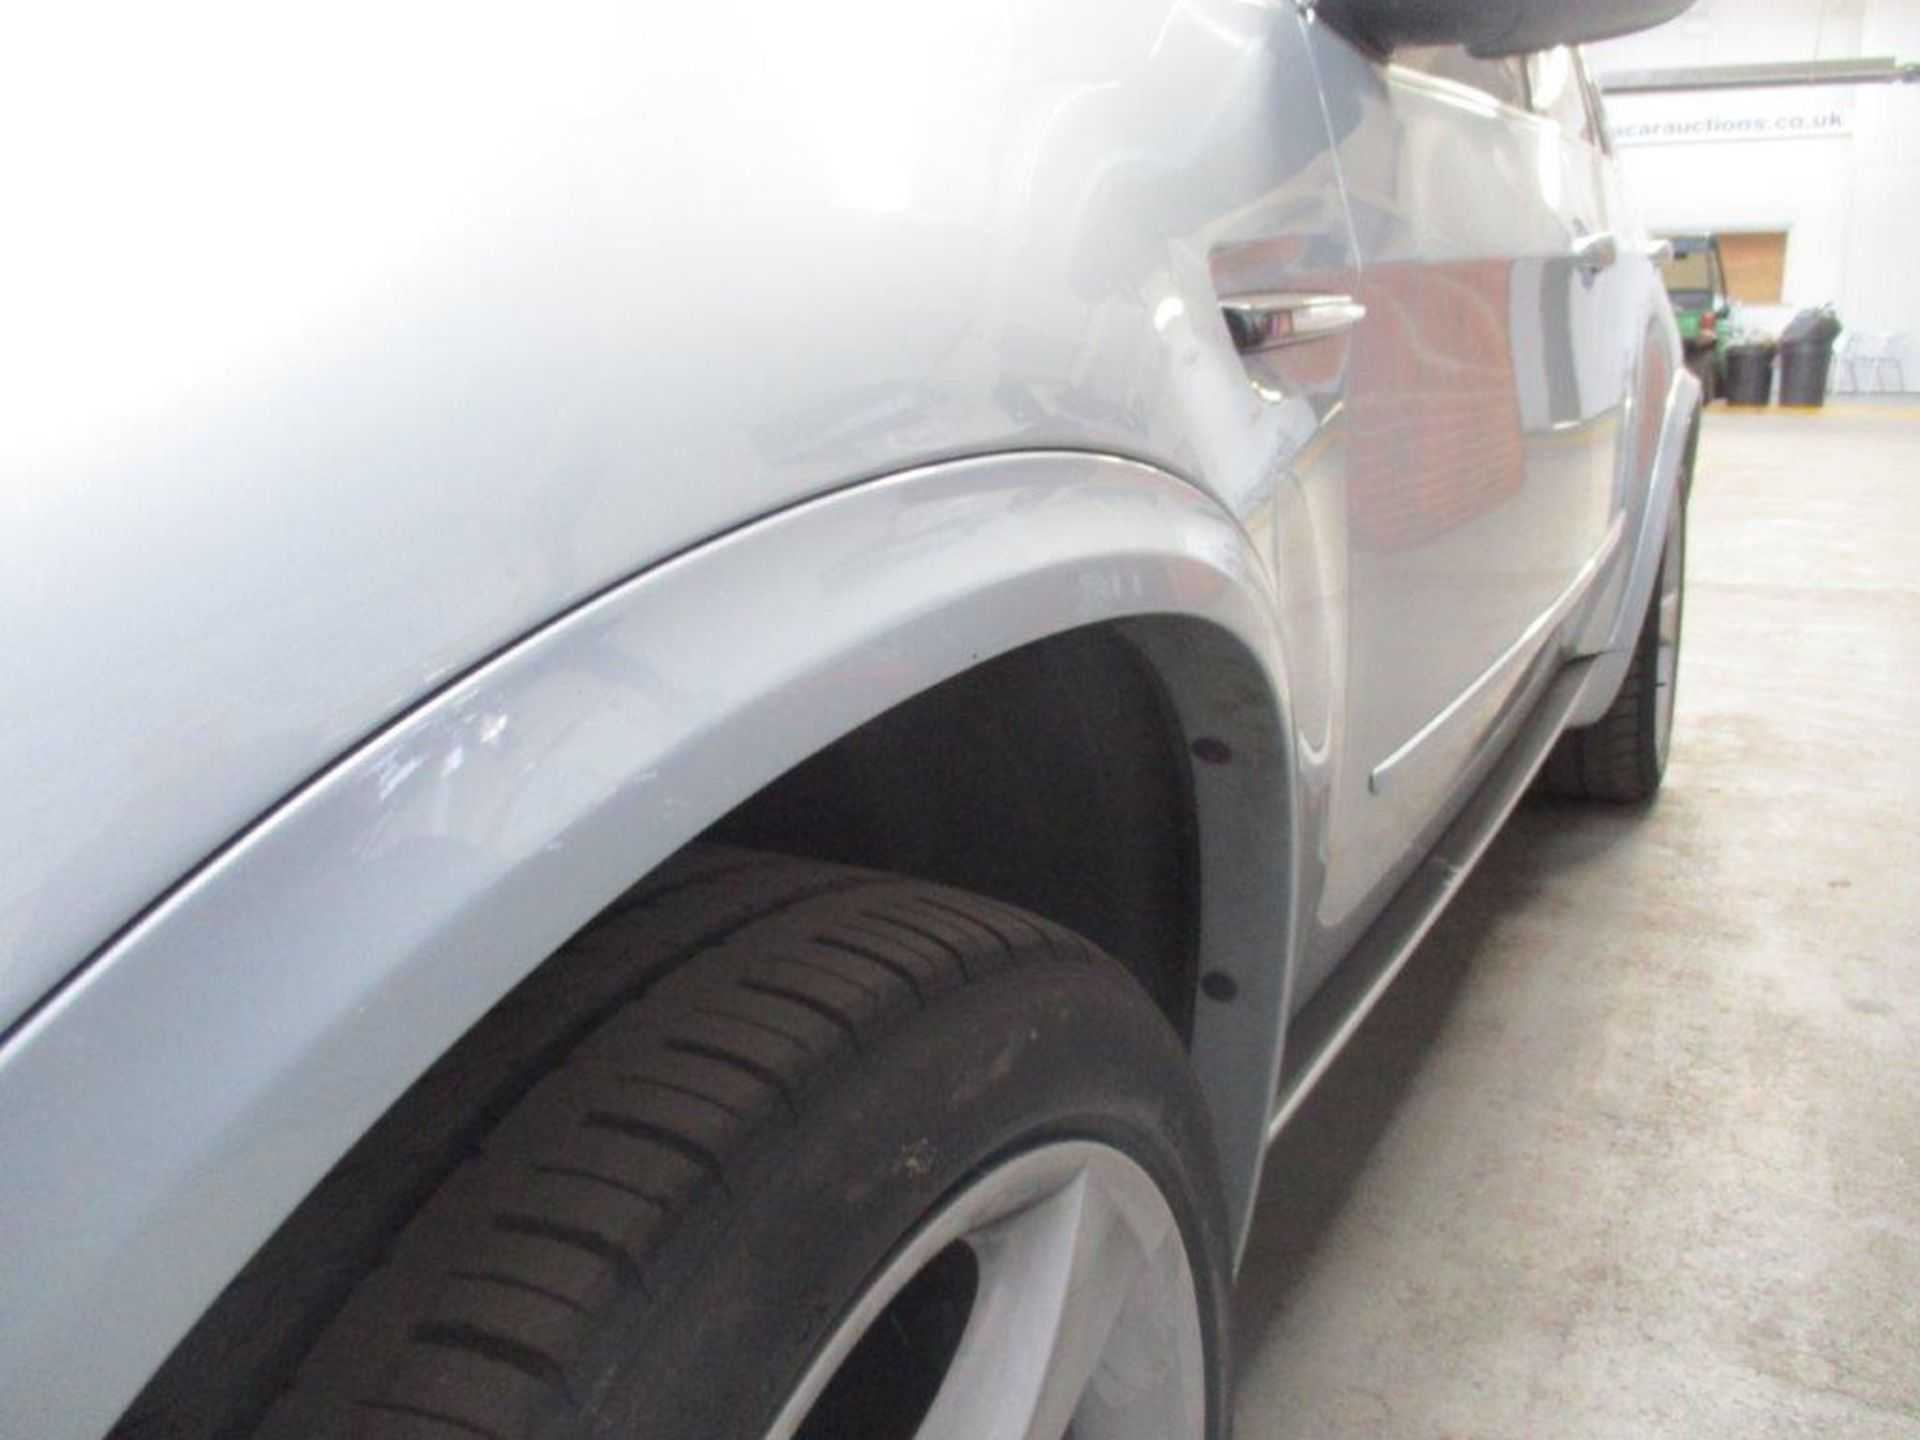 60 10 BMW X5 M Turbo Auto - Image 31 of 35